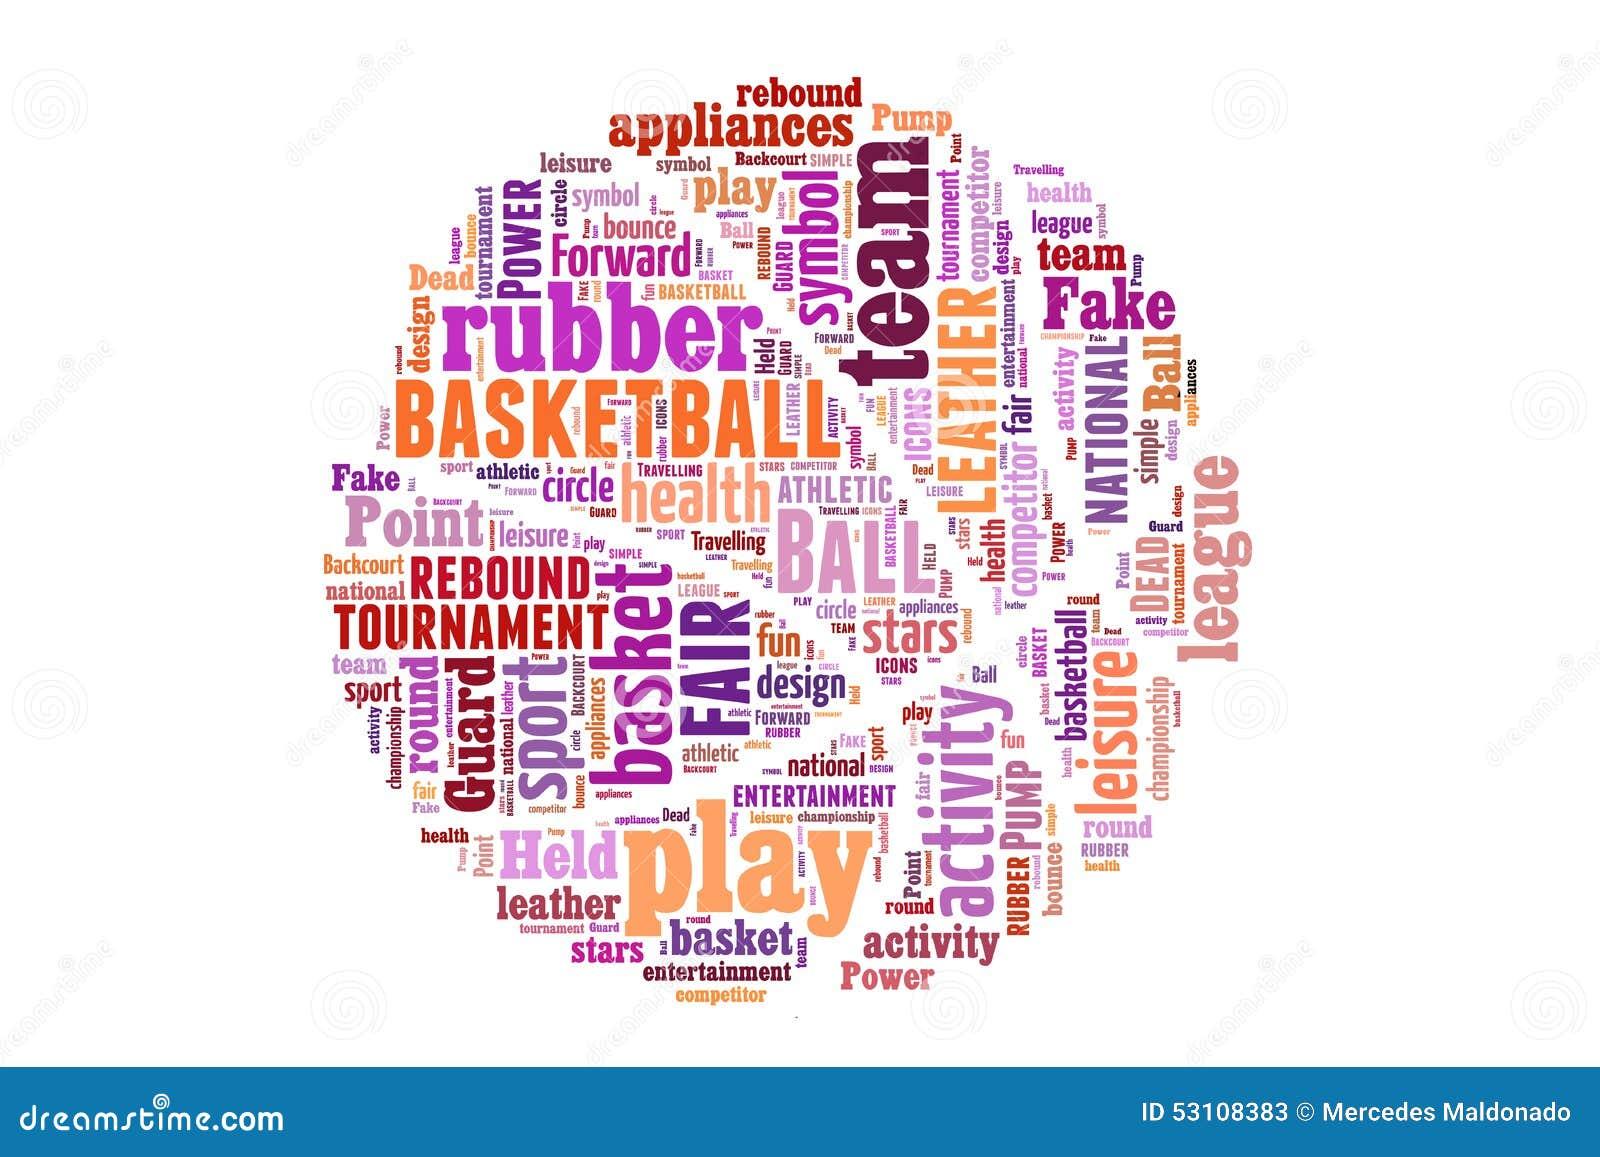 Basketball Word Cloud Concept Stock Illustration - Image ...  Basketball Word...